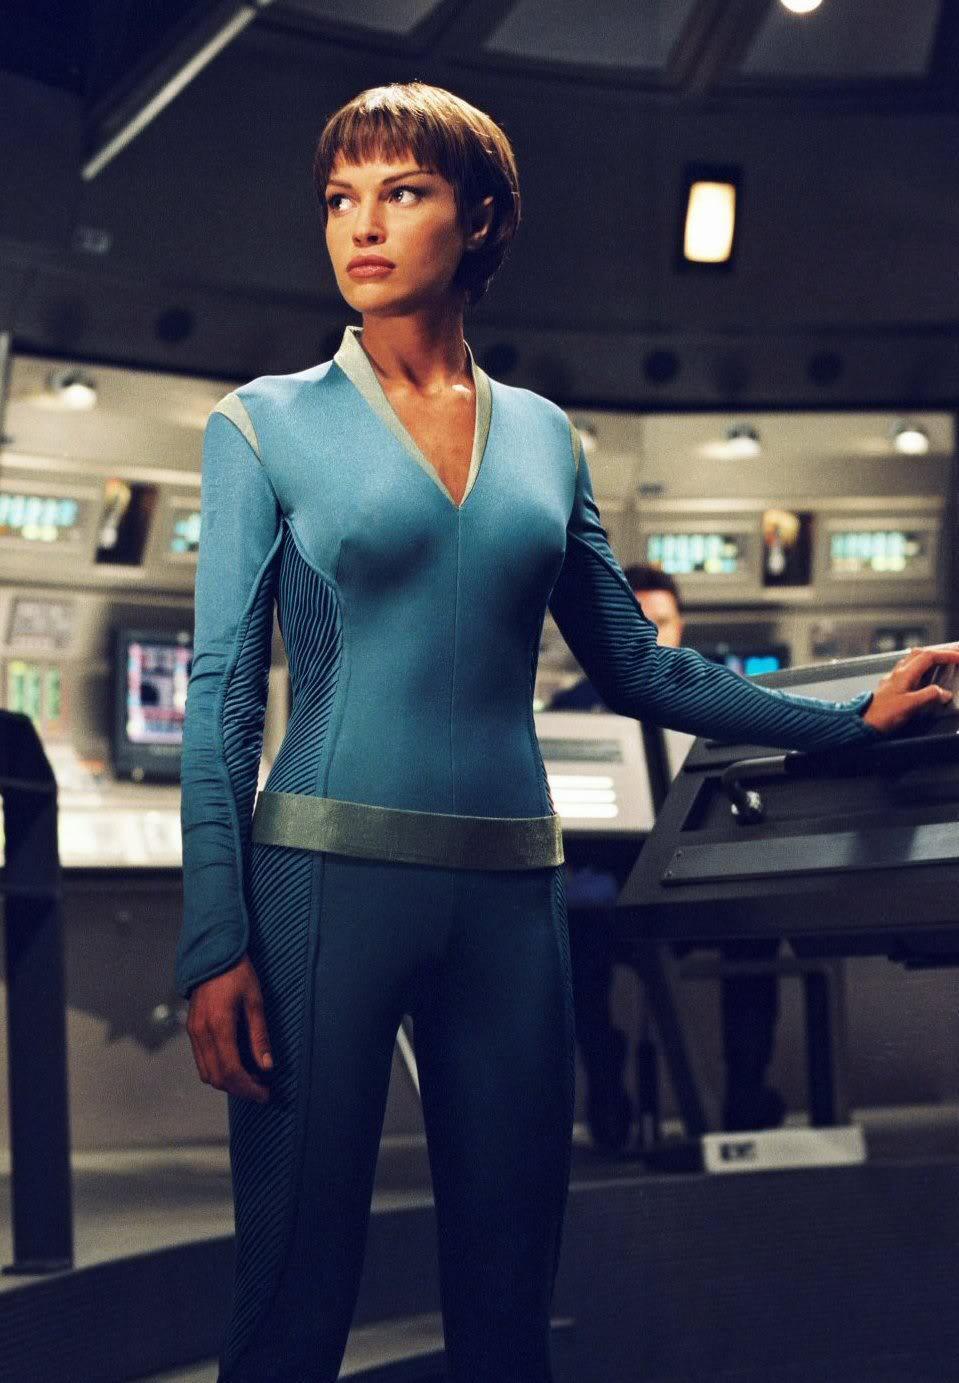 Star trek costumes sexy